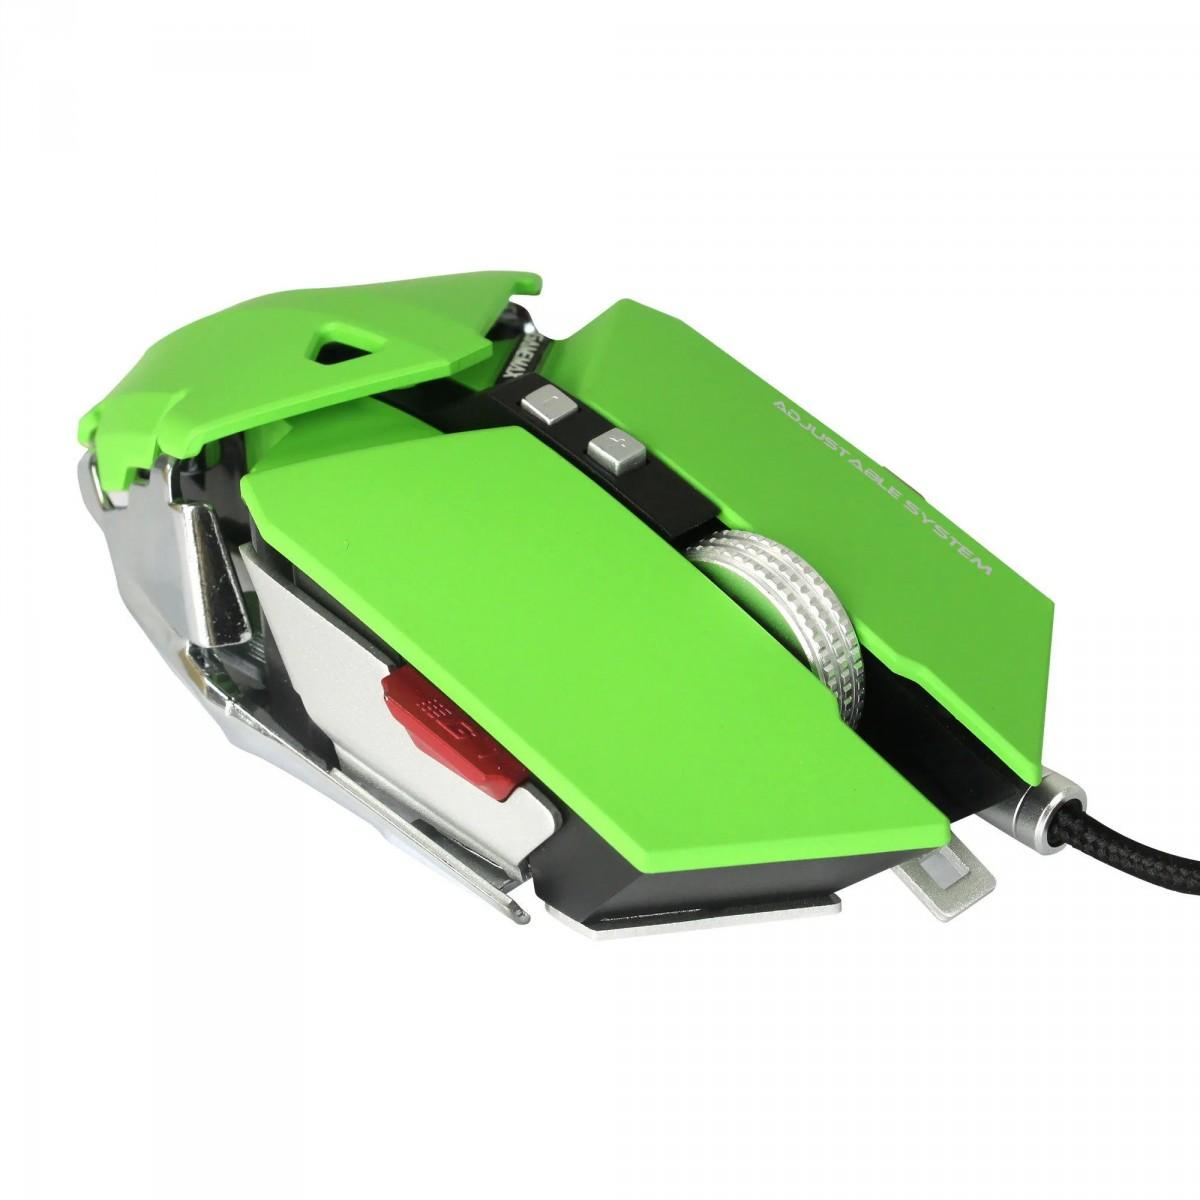 Mouse Gamer Gamemax, GX9 Metal, 4000 DPI, 10 Botões, Green, GX9